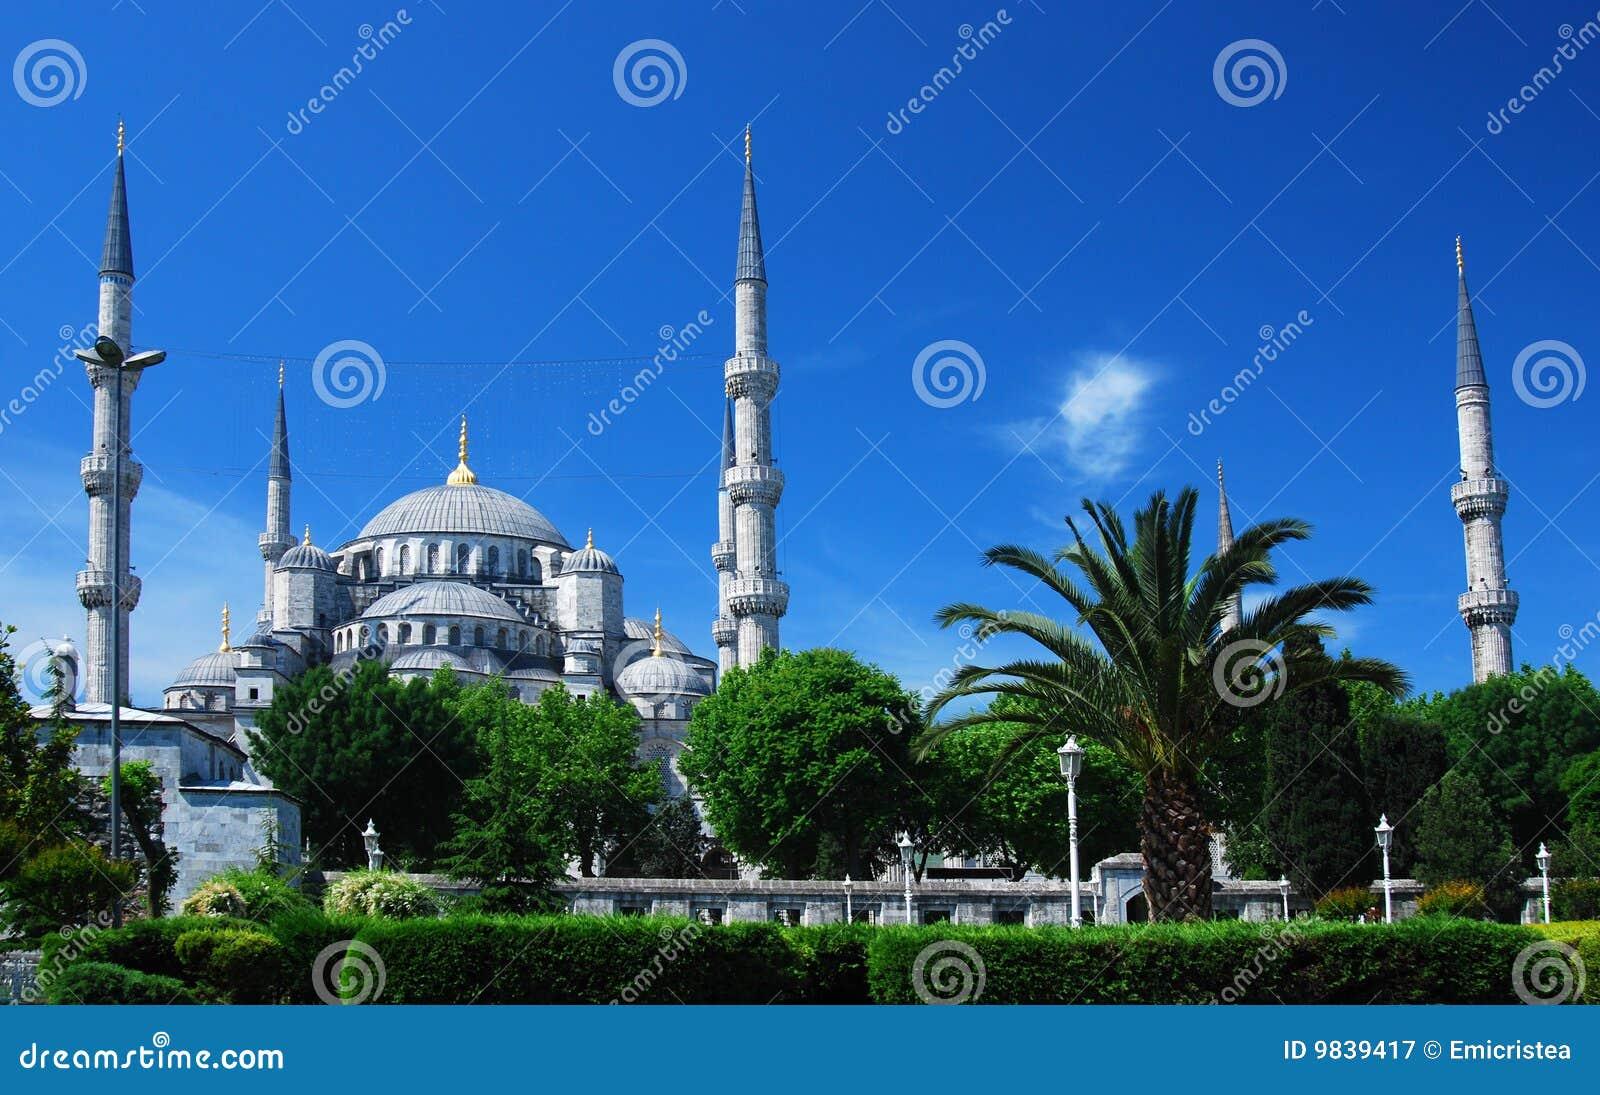 Blue Mosque (Camii) Istanbul